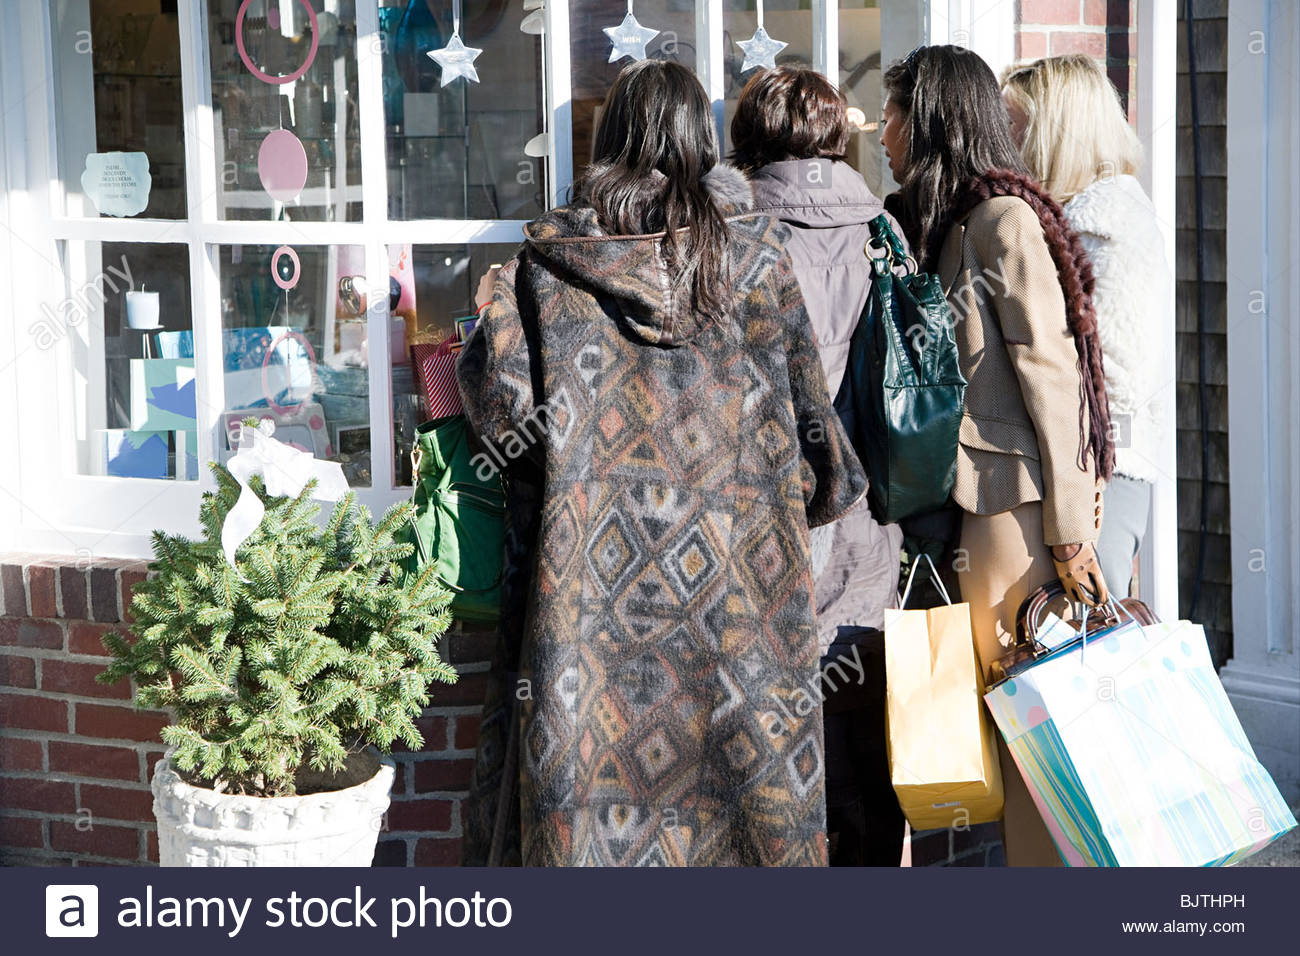 Women looking in shop window - Stock Image